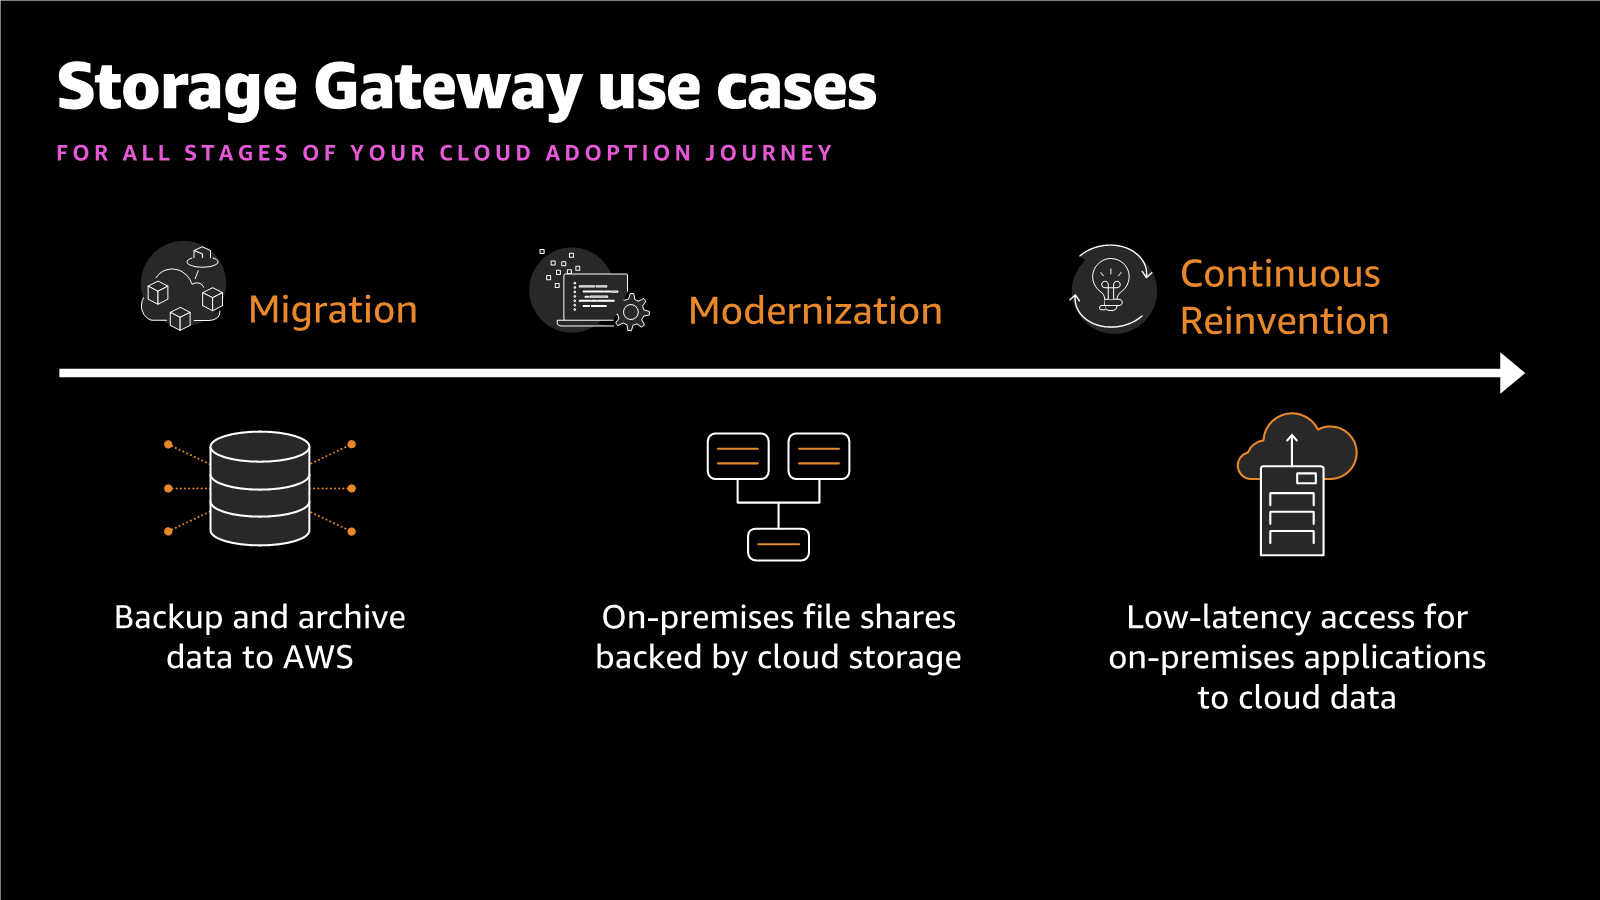 AWS Storage gateway use cases - Migration - Modernization - Continuous Reinvention